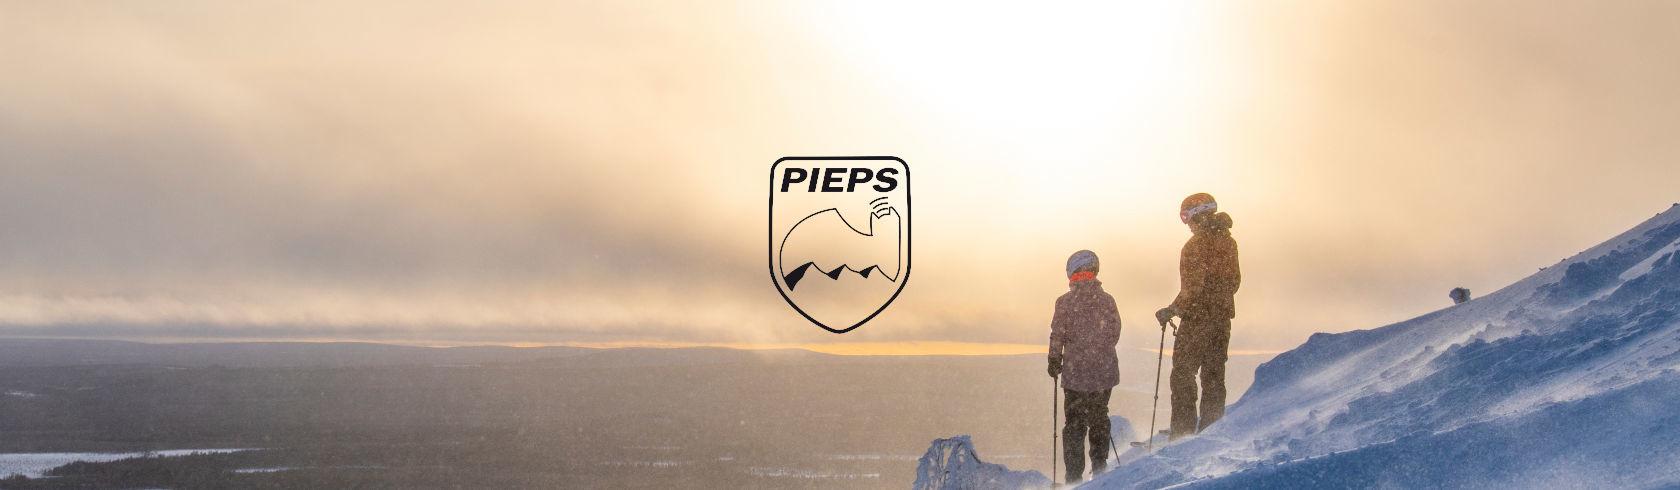 Pieps brand logo